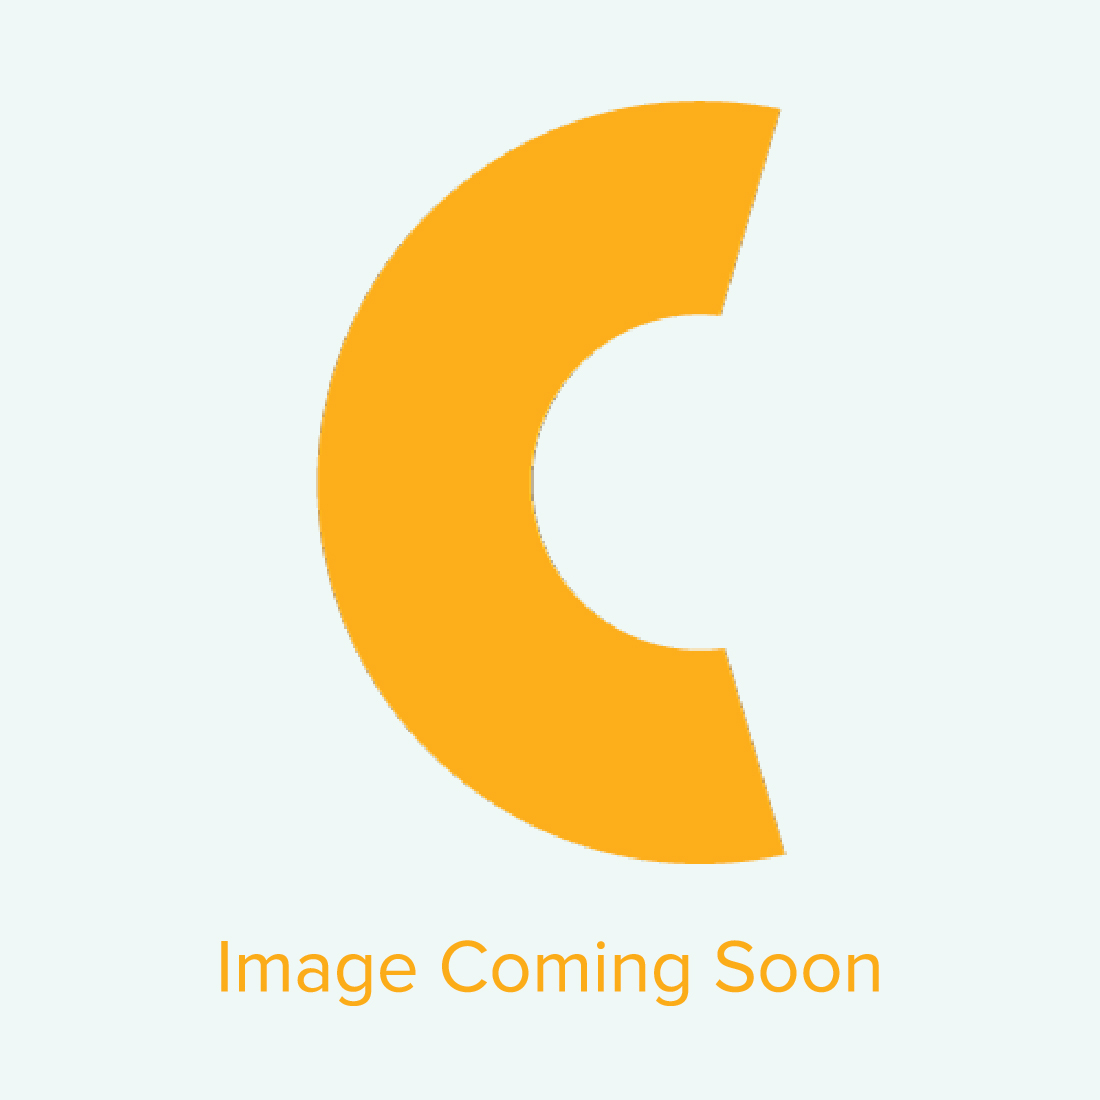 "Hexagon-Shaped Aluminum Sublimation Magnet – 2.5"" x 2.2"""